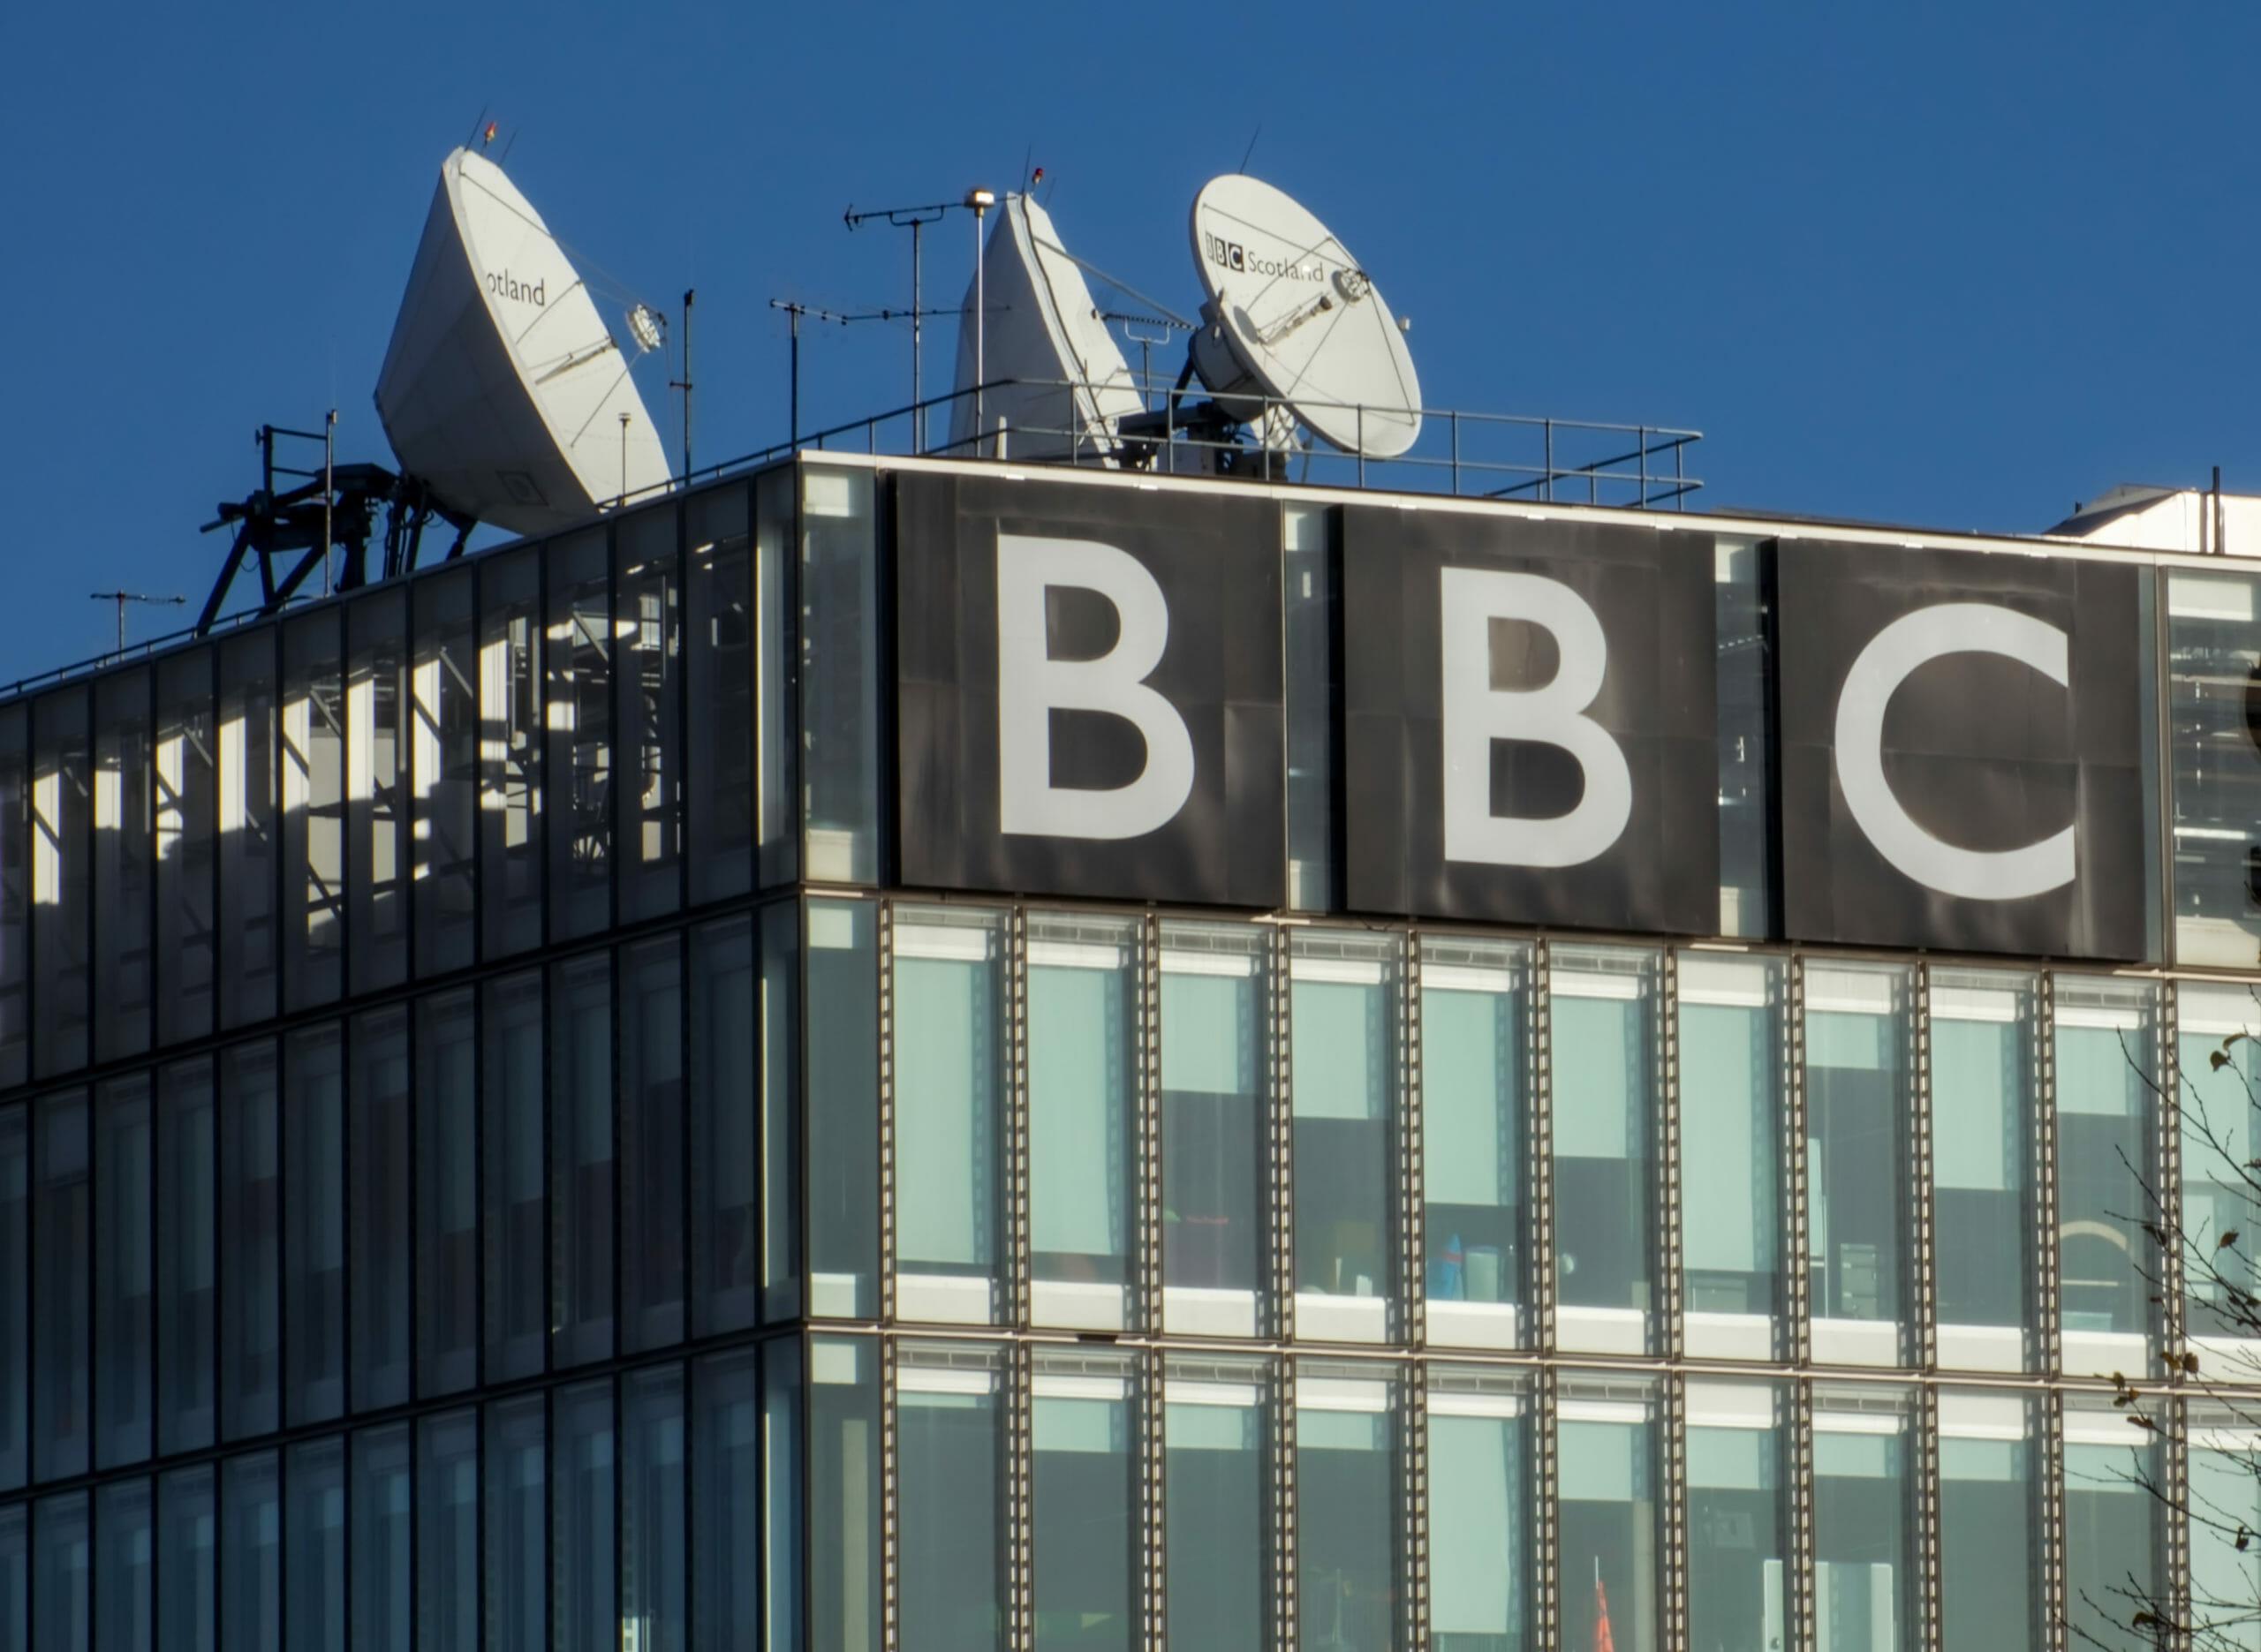 Kina slukker for BBC-kanal